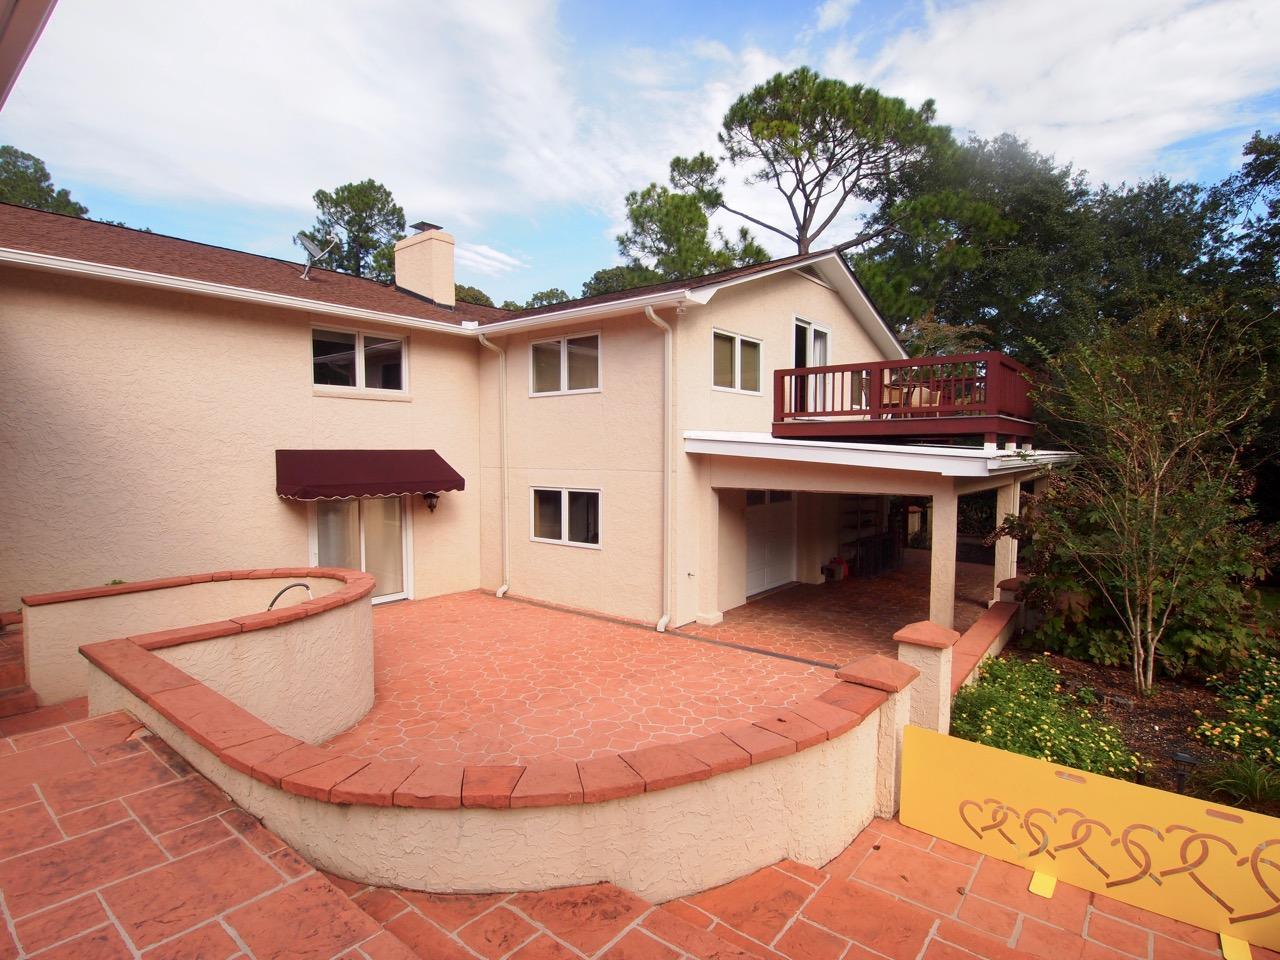 Santee Cooper Resort Homes For Sale - 337 Santee, Santee, SC - 16